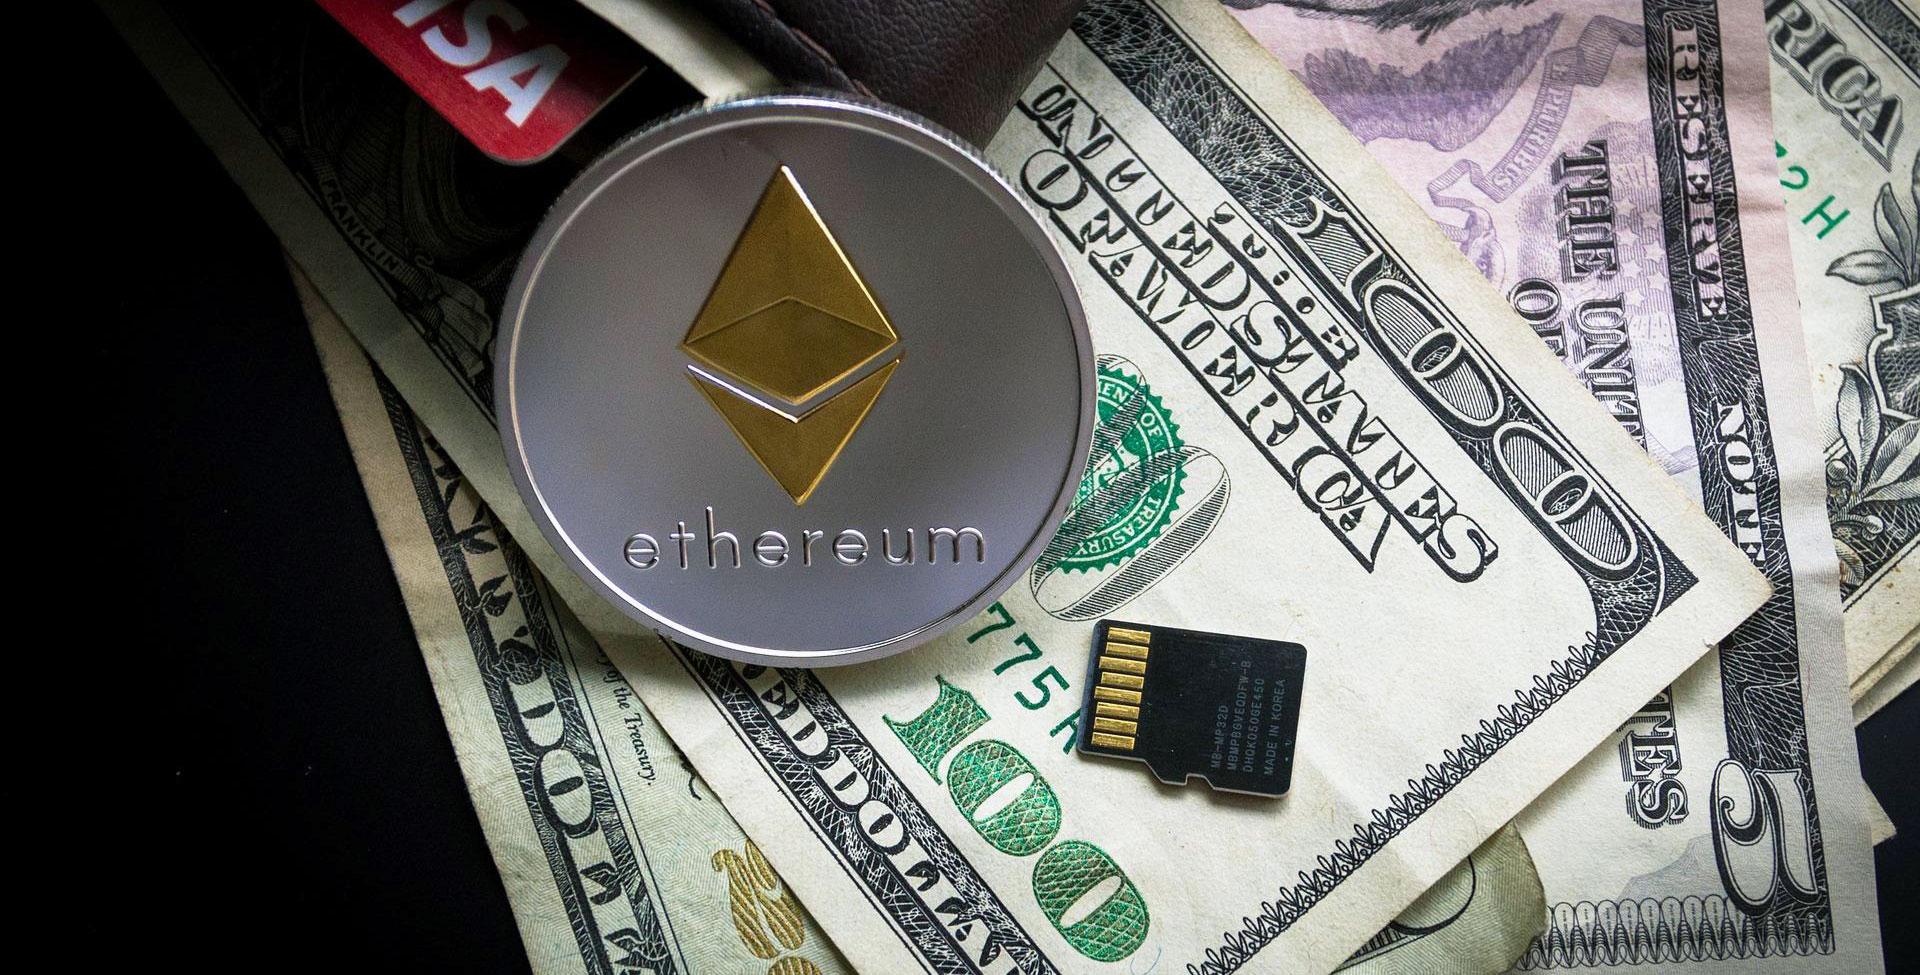 Взломали блокчейн-платформу. Потери — $5,7 млн